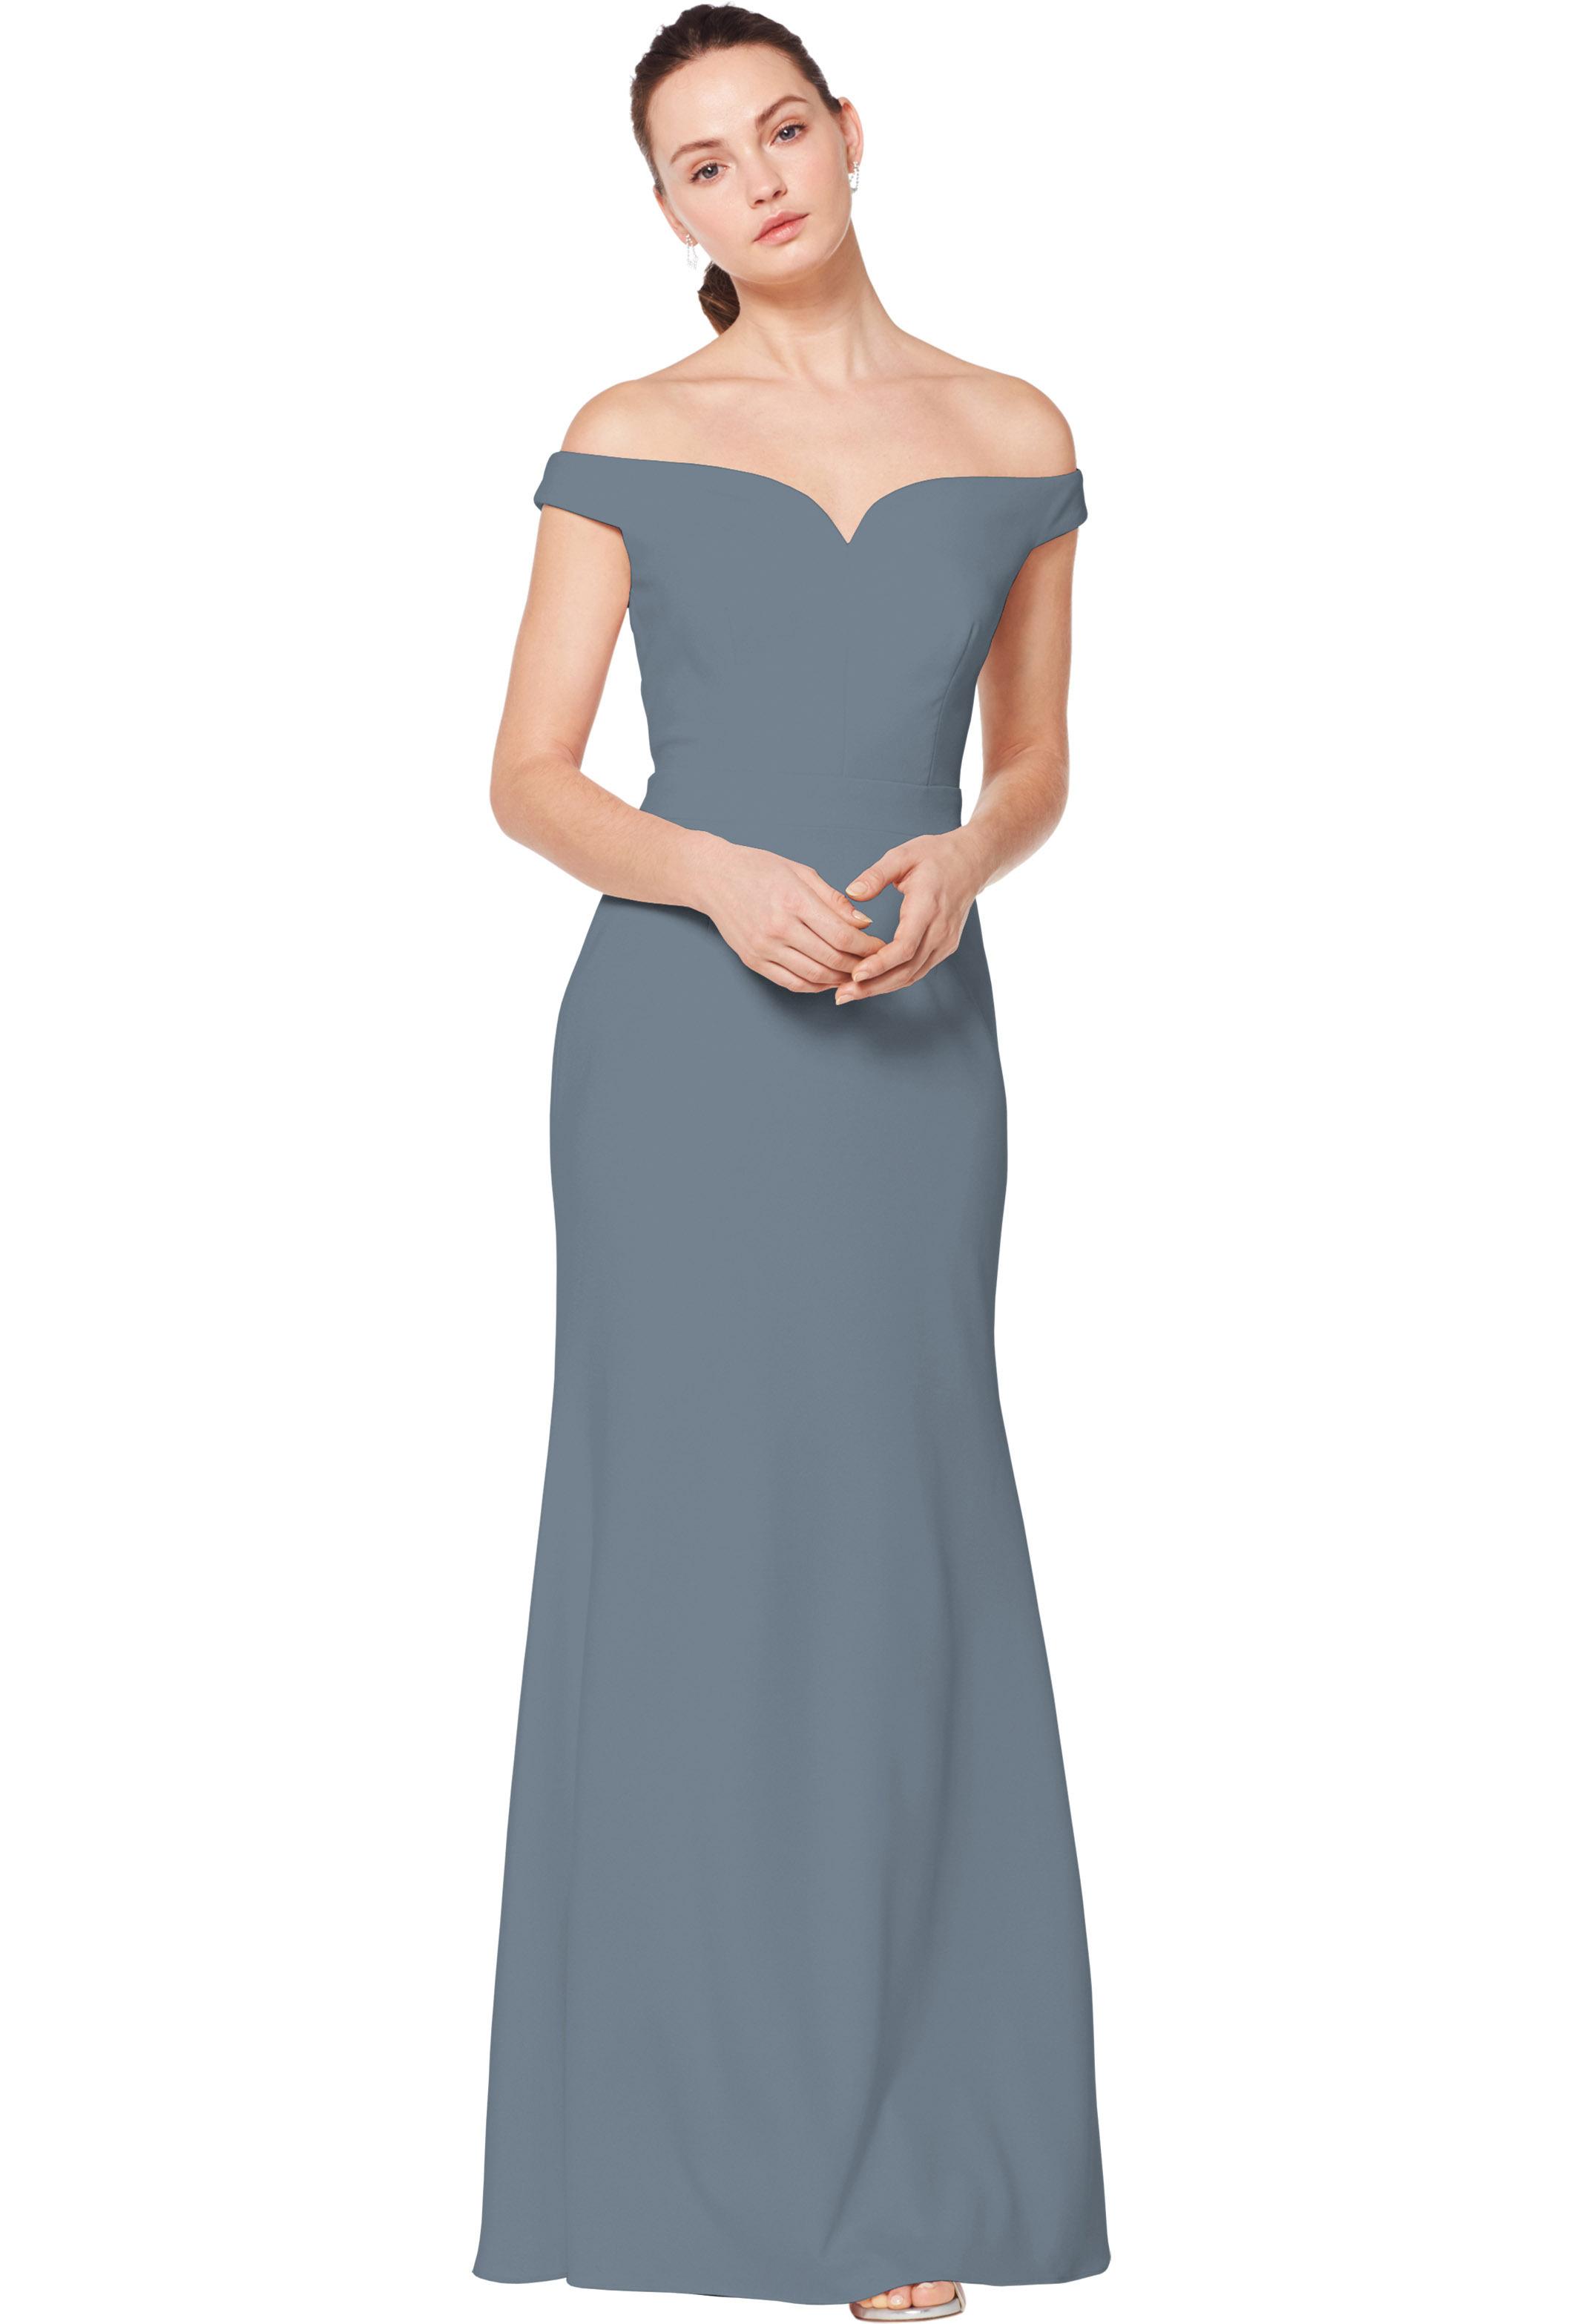 Bill Levkoff SLATE Stretch Crepe Off The Shoulder Natural Waist gown, $220.00 Front